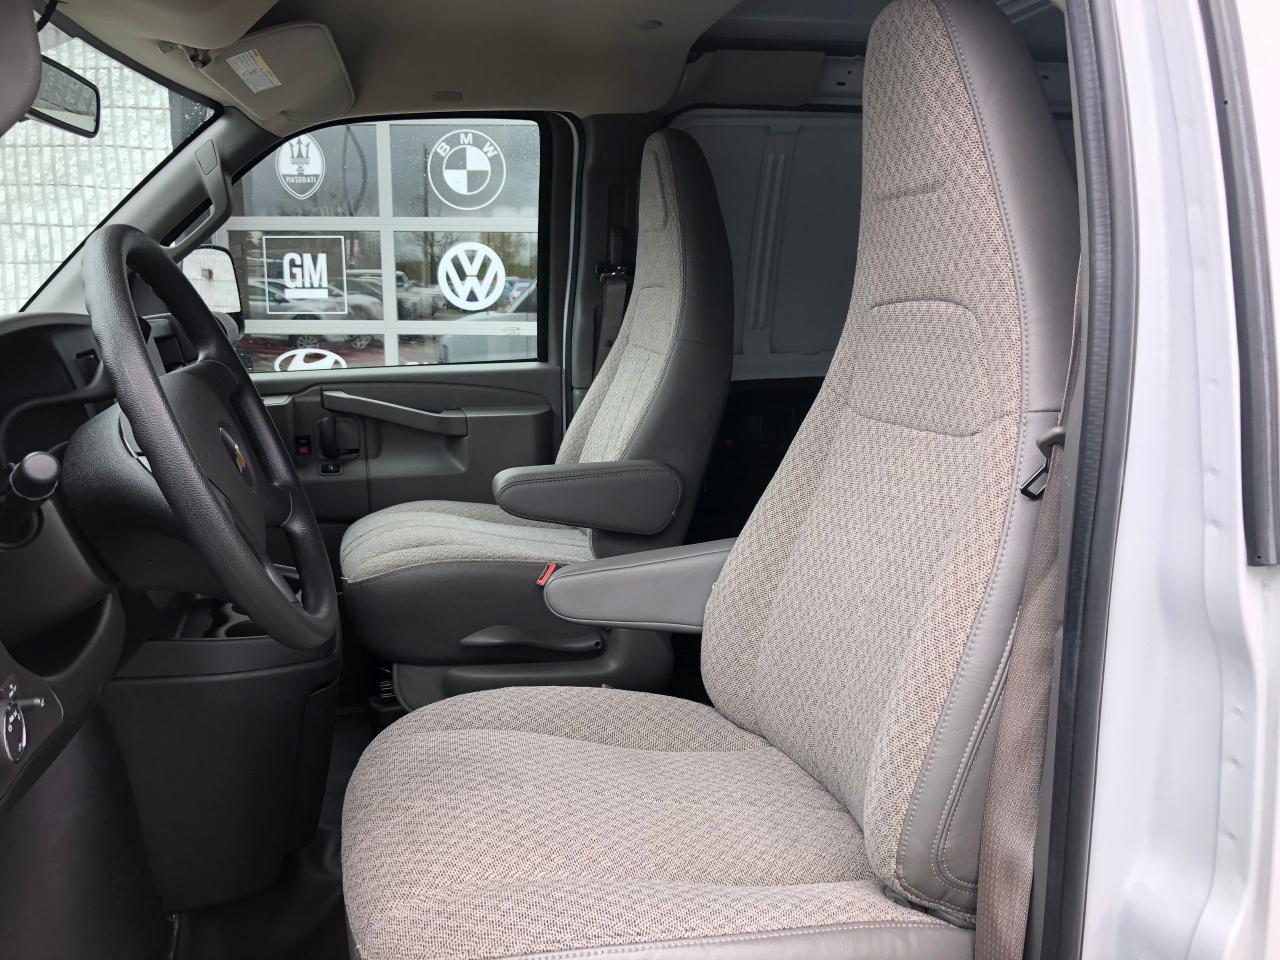 2018 Chevrolet Express